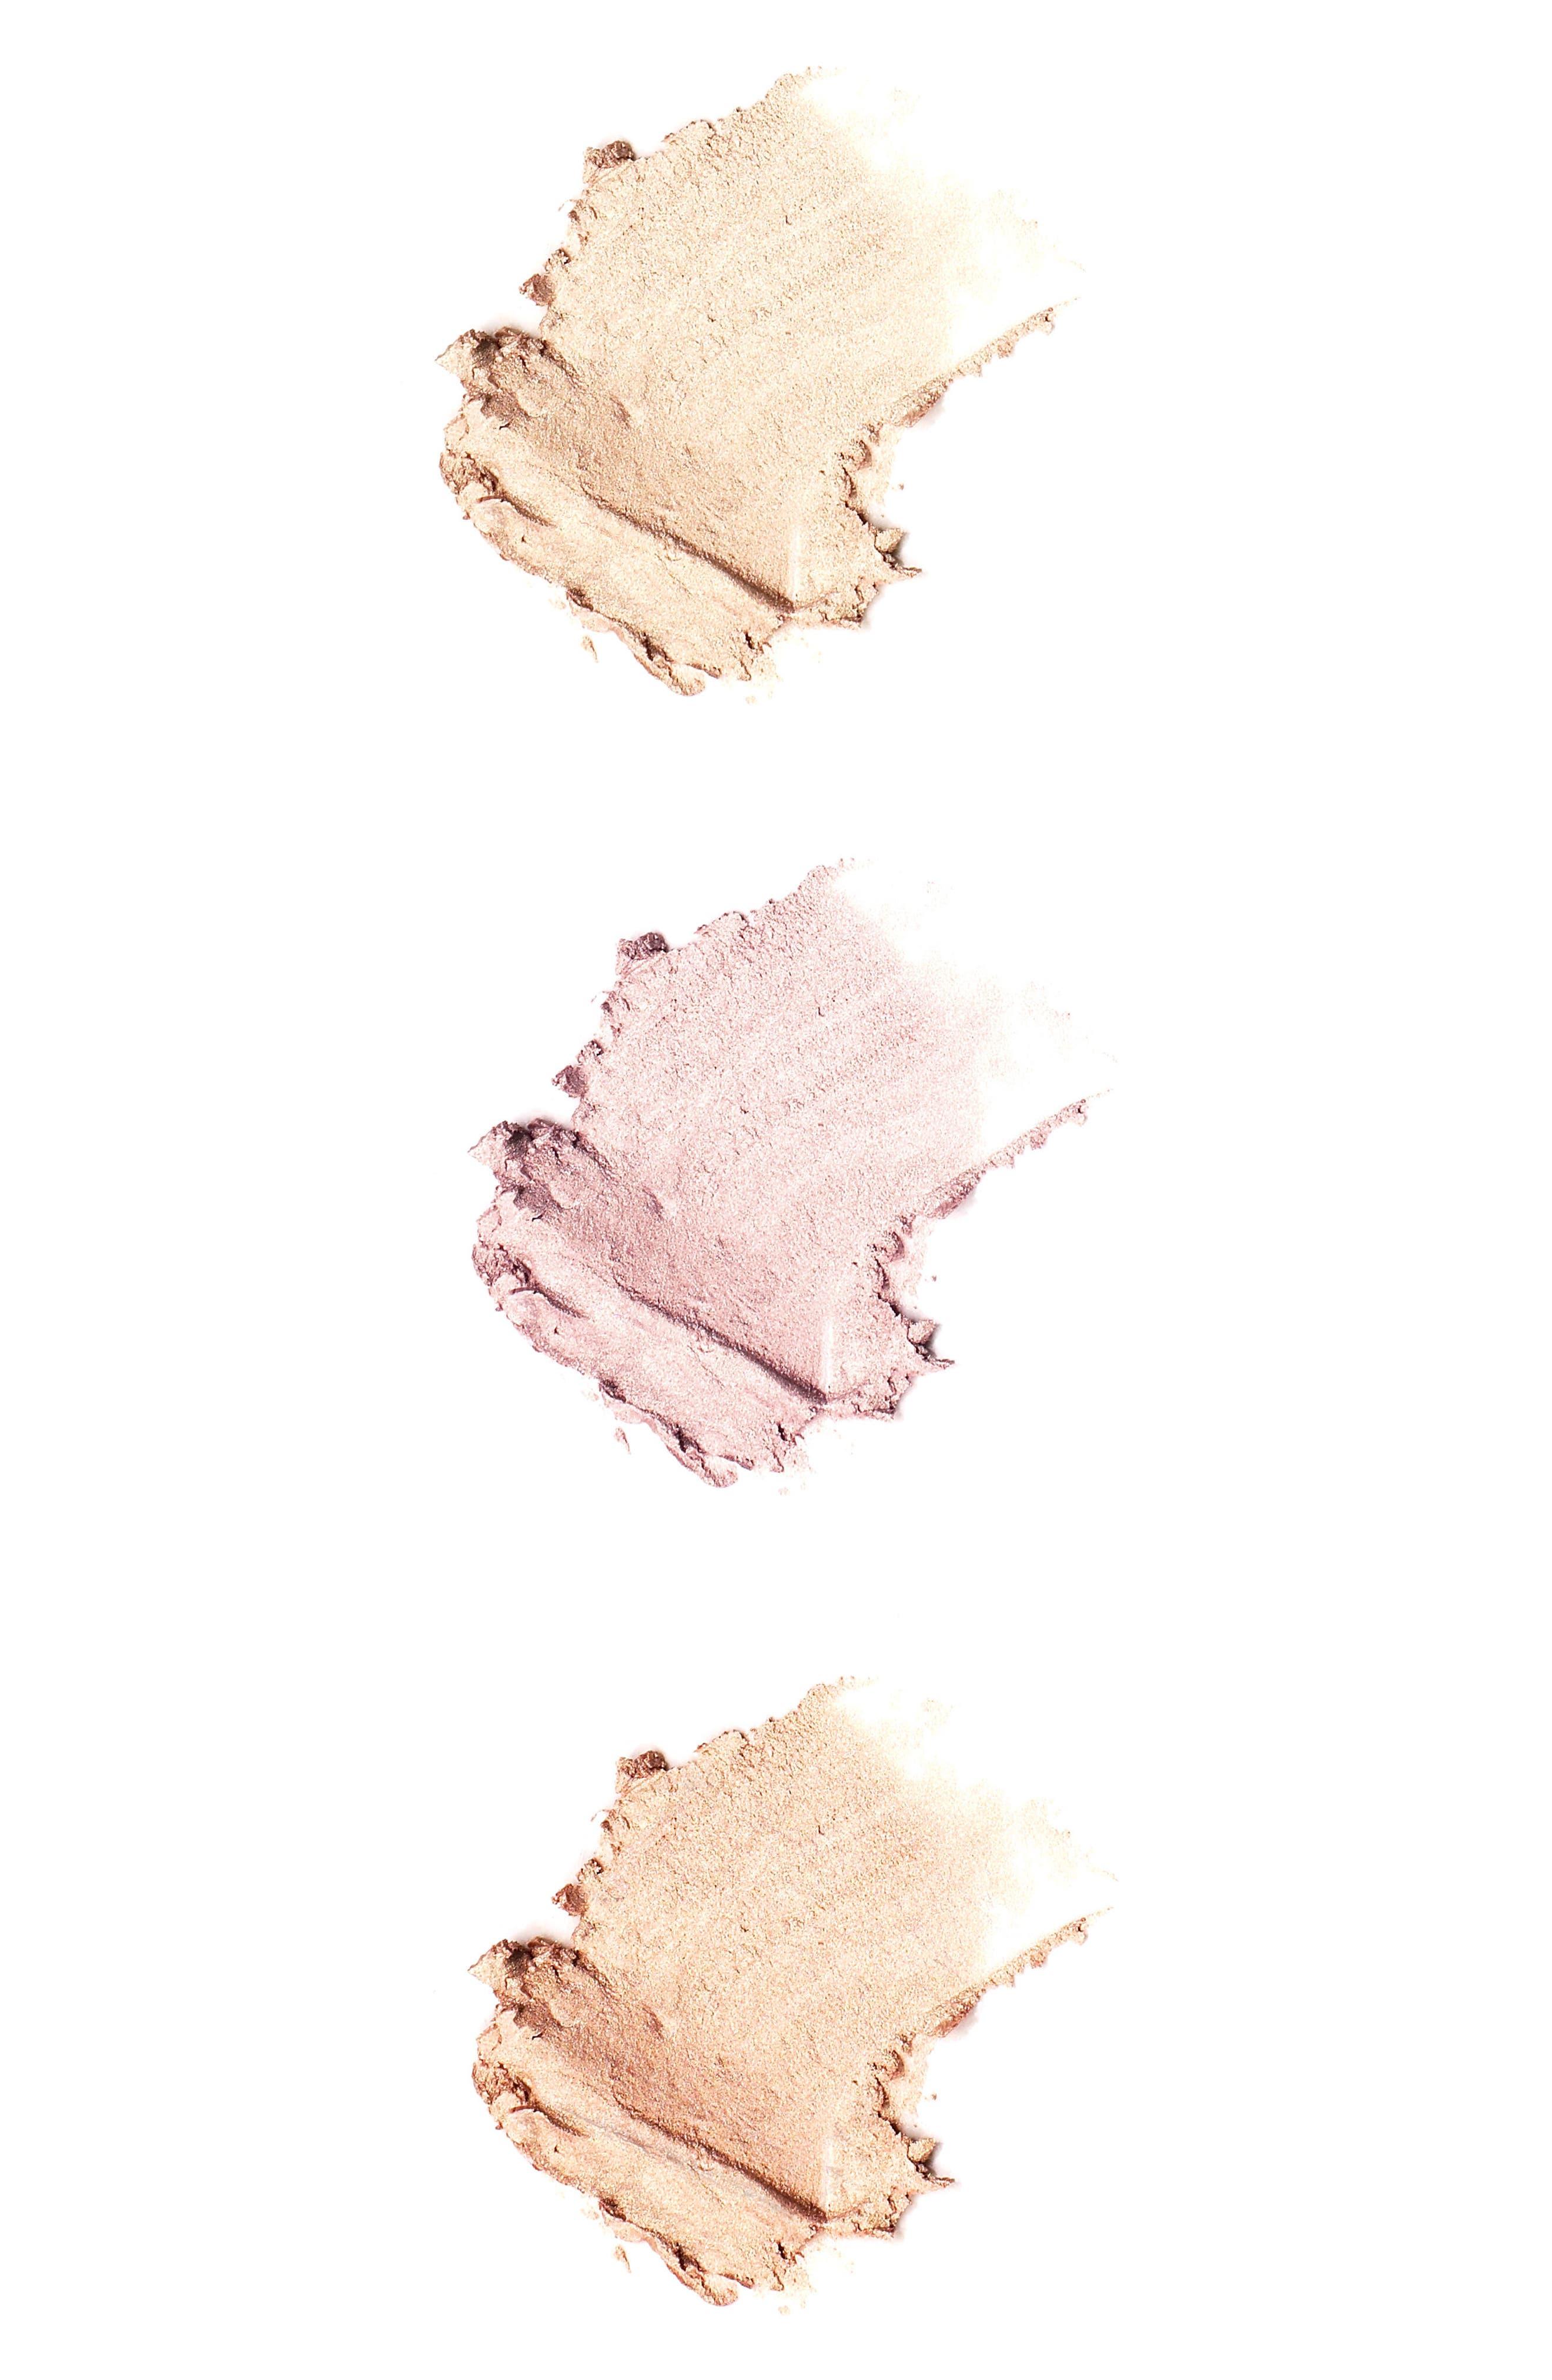 Skinny Dip, Peach & Rose Gold Powder Highlighter Trio,                             Alternate thumbnail 3, color,                             No Color